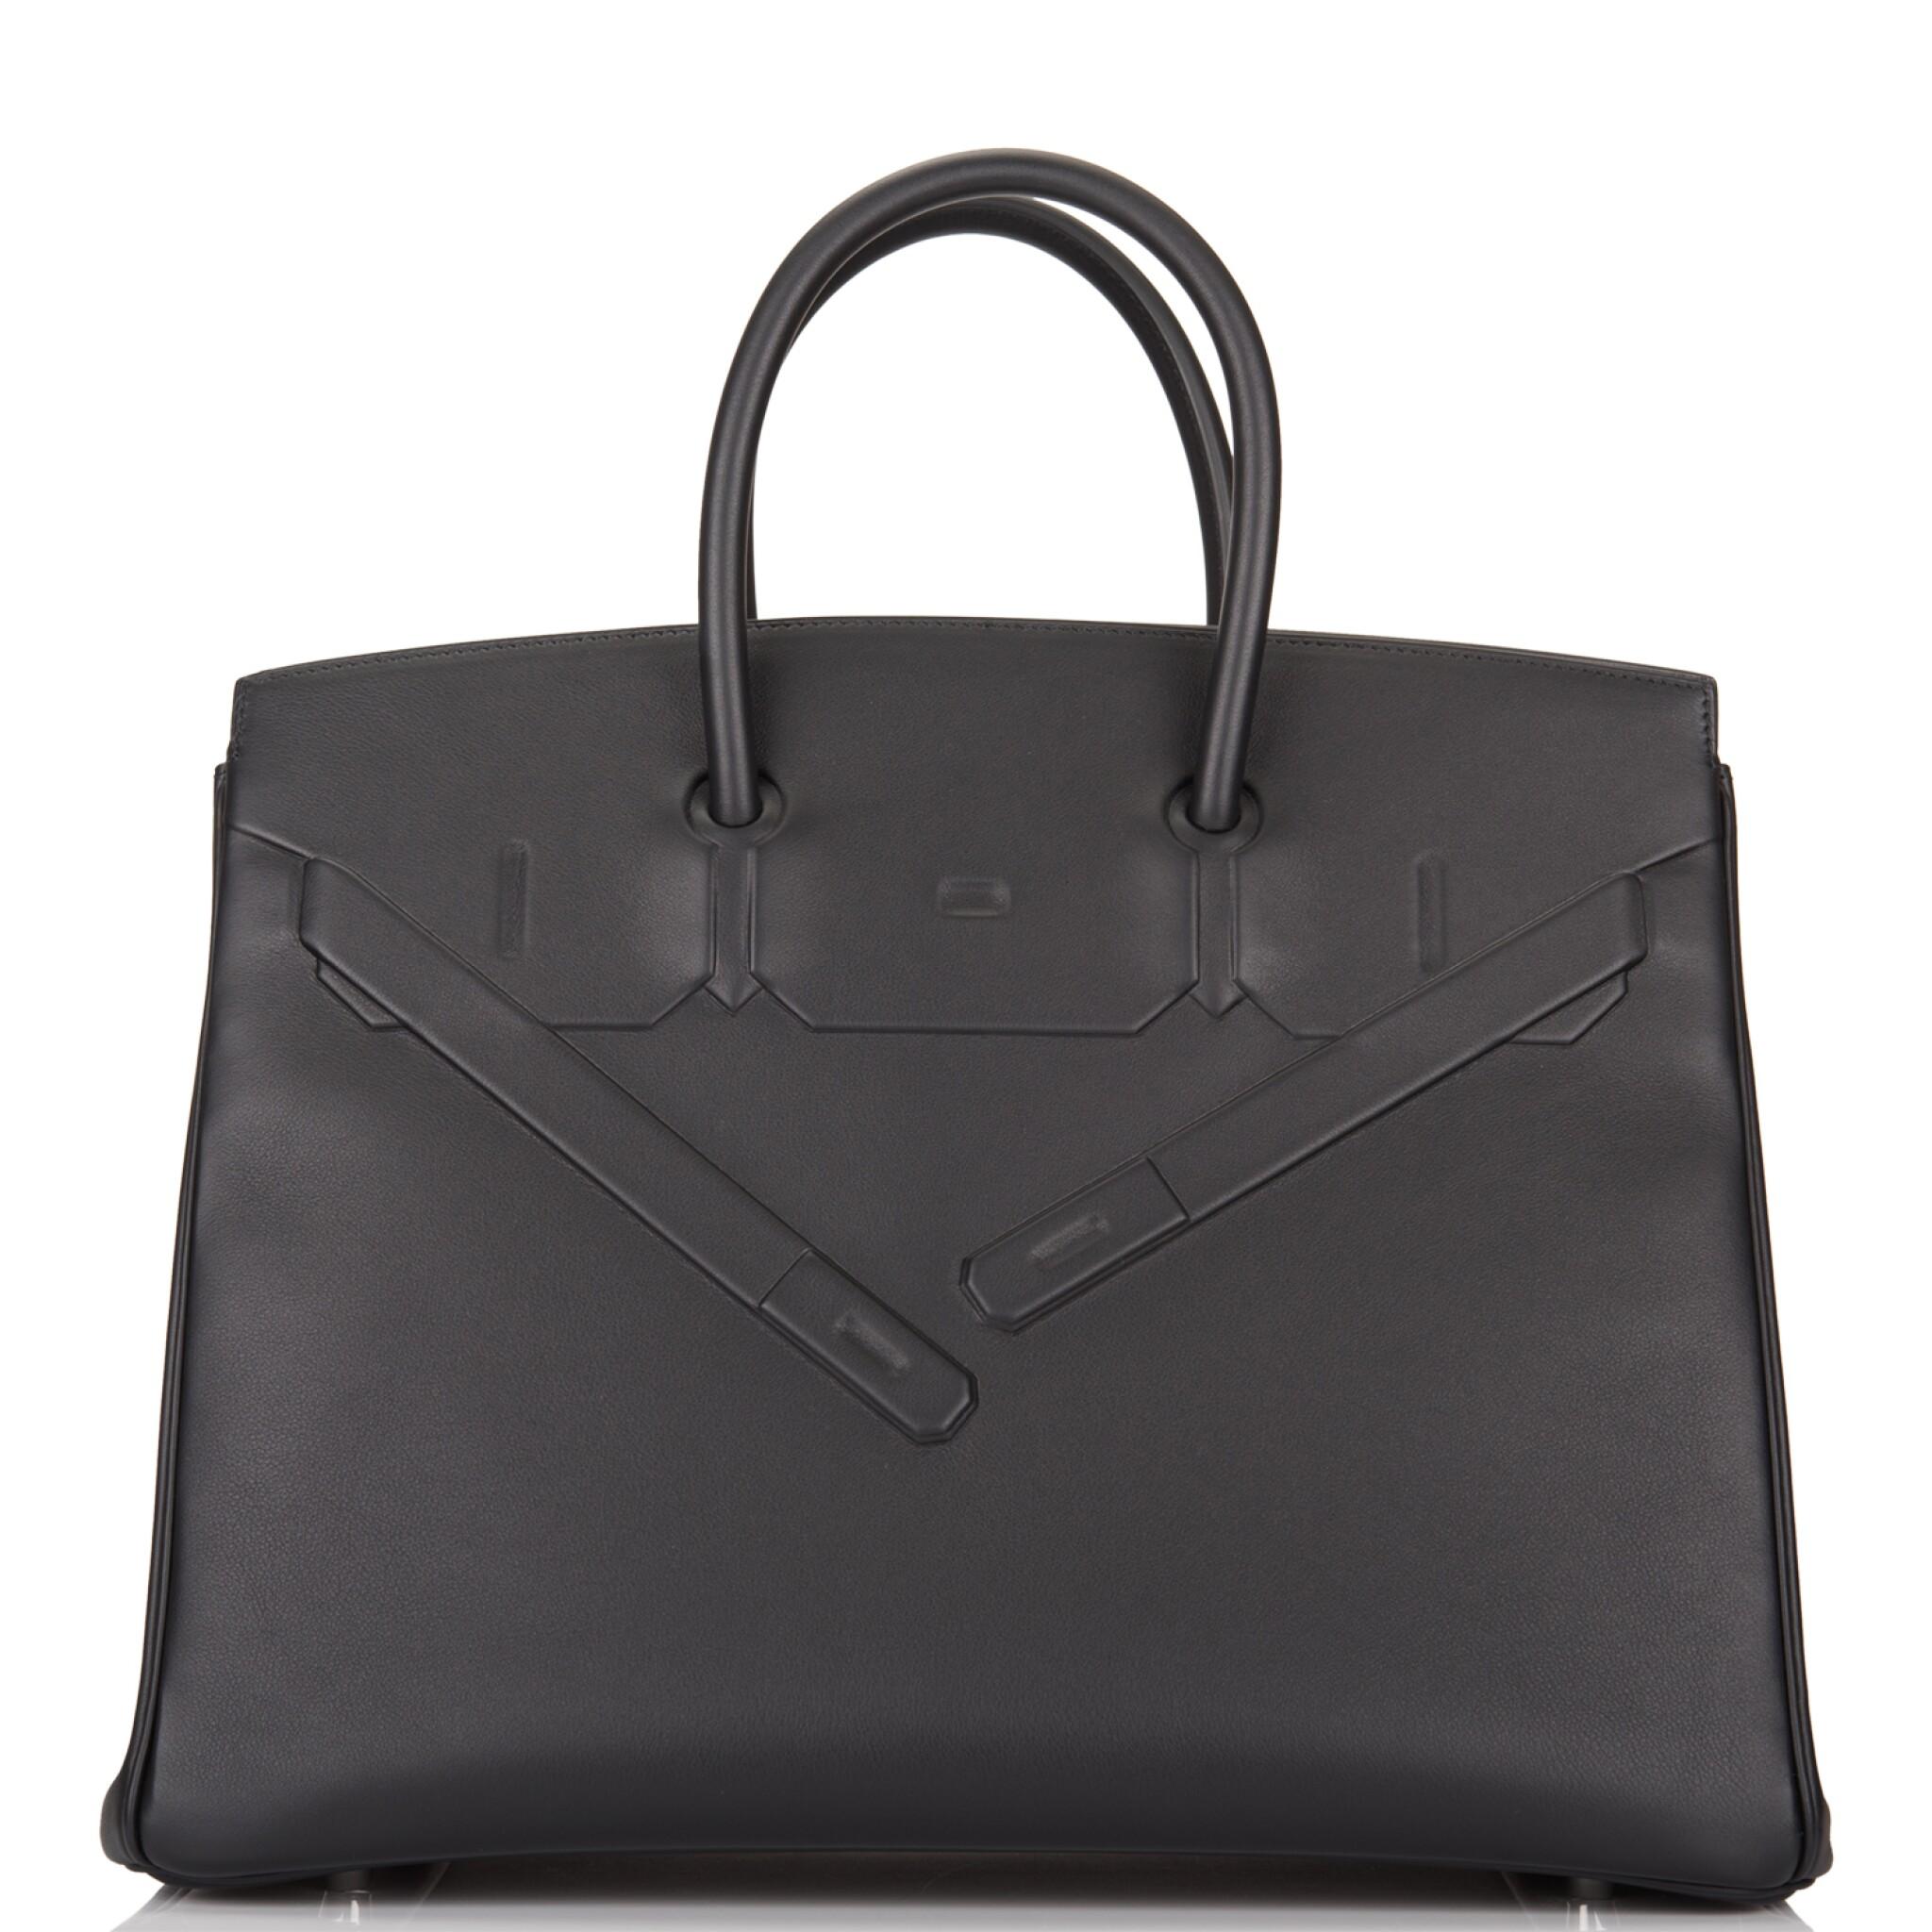 View 1 of Lot 32. Hermès Black Shadow Birkin 35cm of Swift Leather.